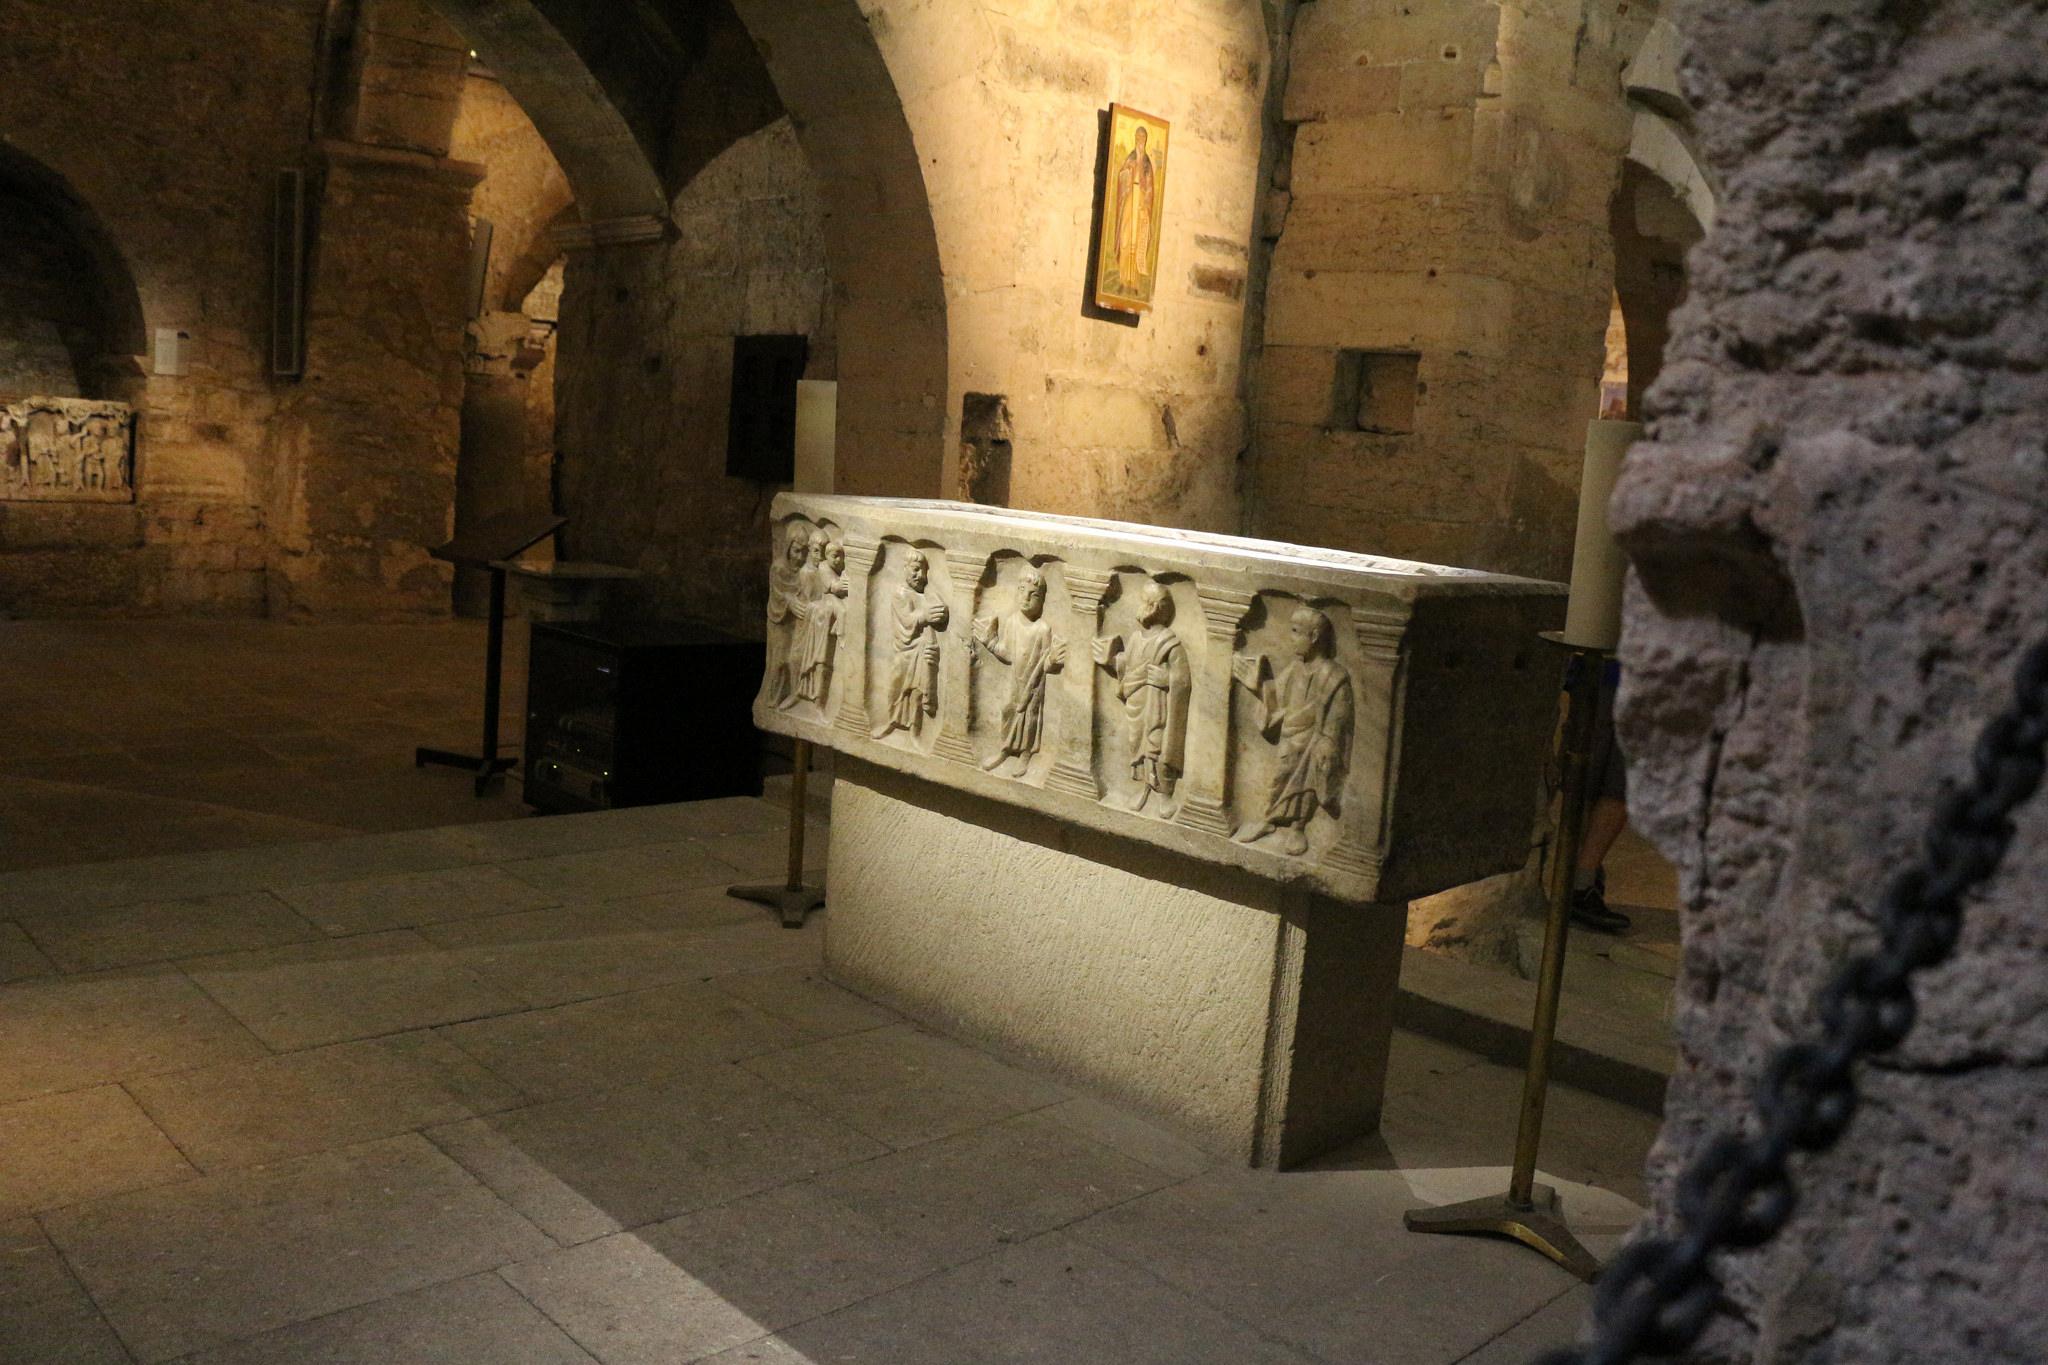 Аббатство Сен-Виктор, алтарь-саркофаг